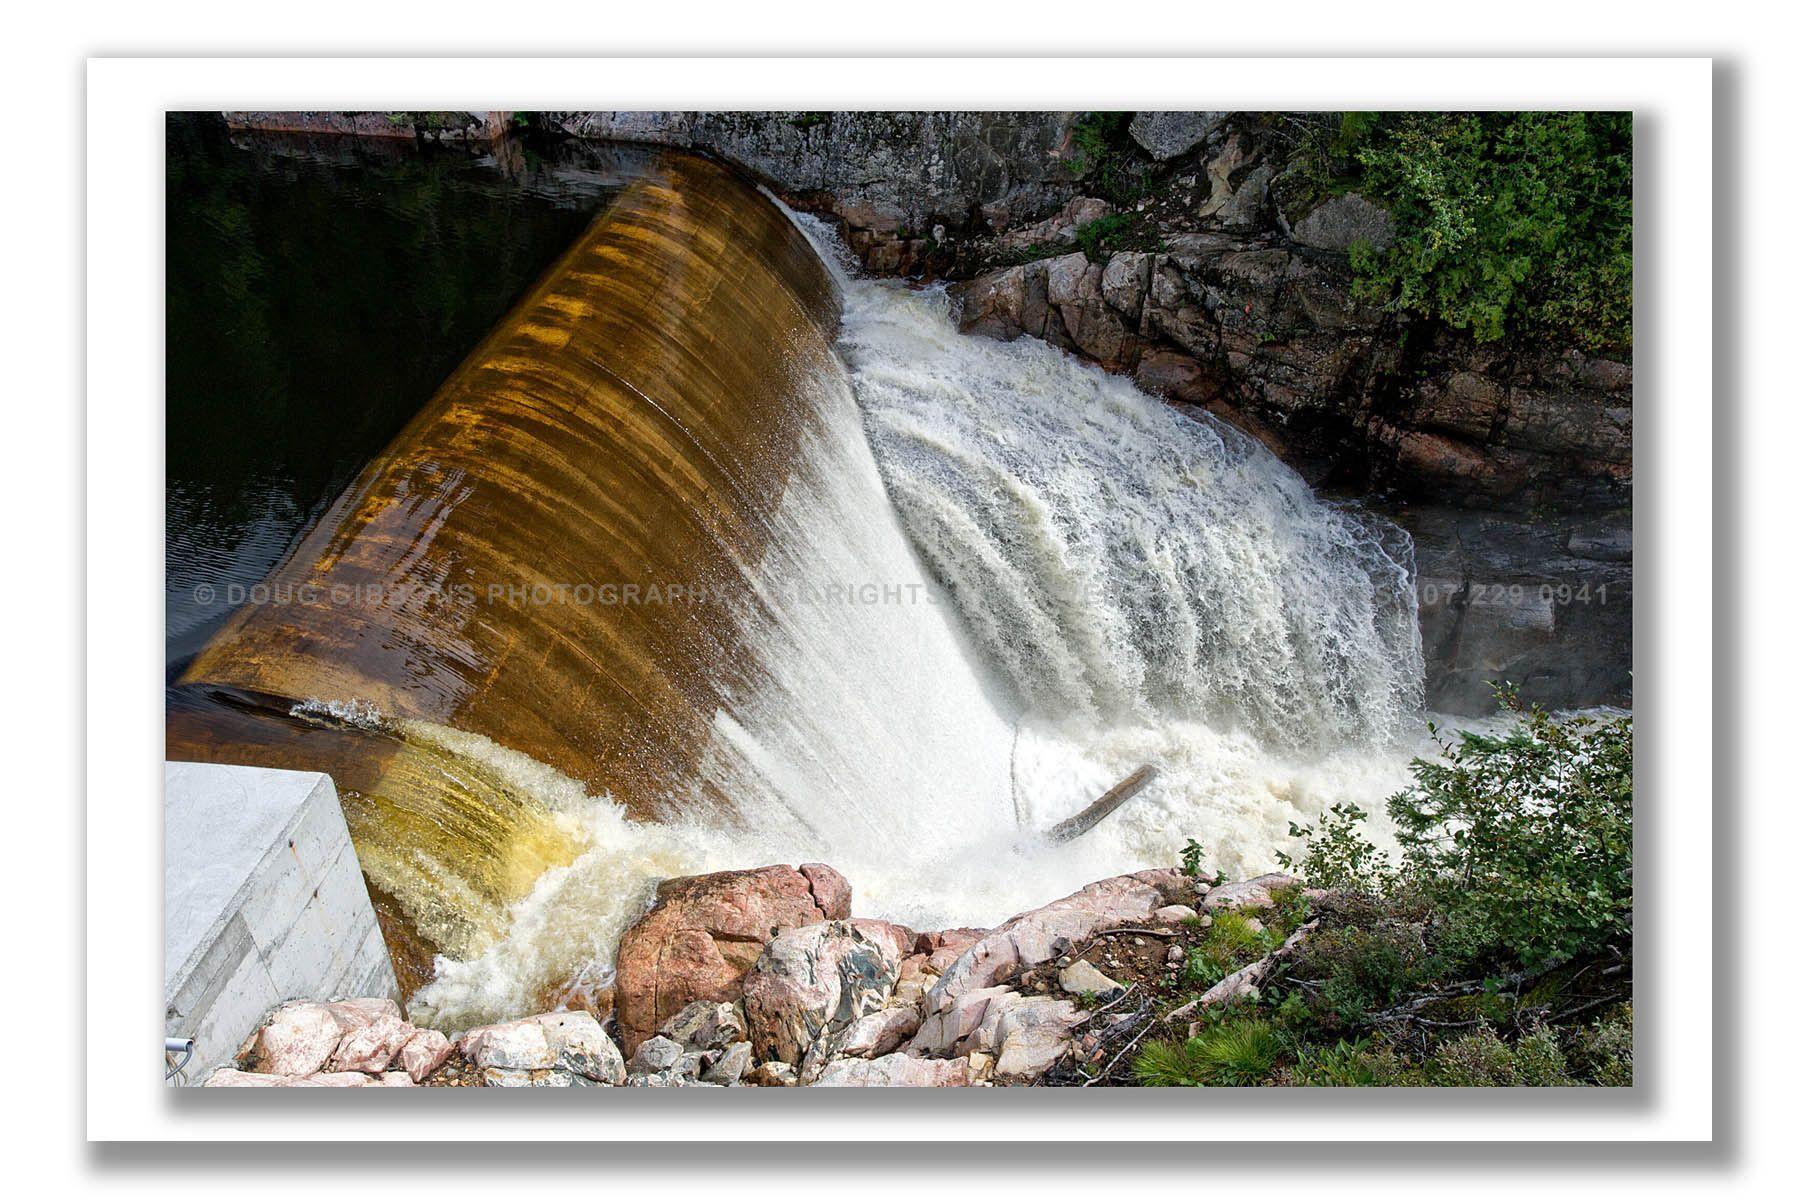 Umbata Weir overflow dam